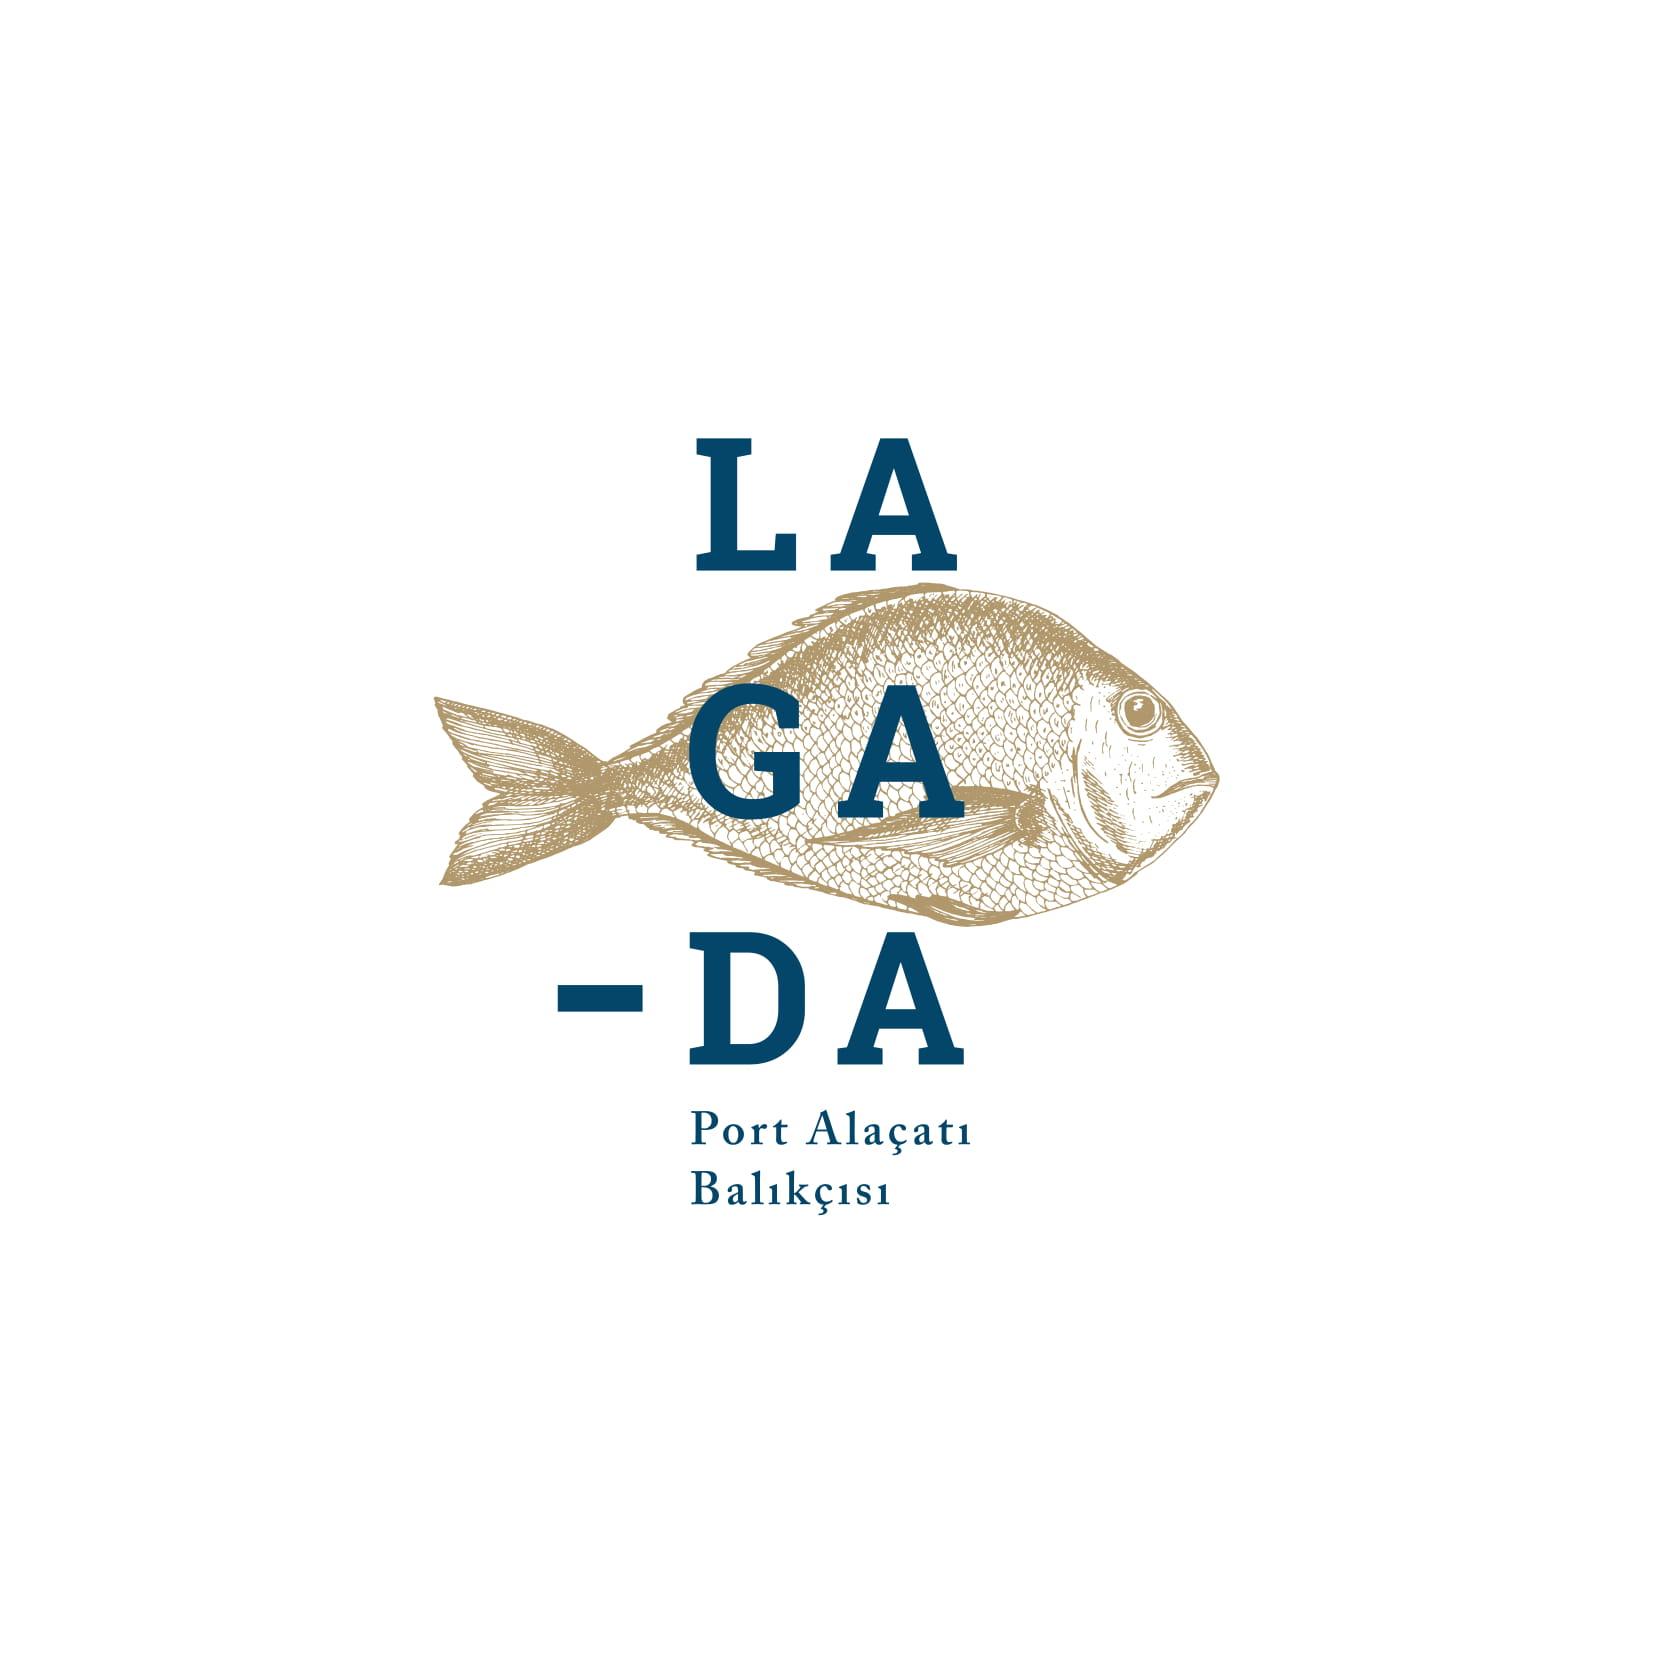 LAGADA-1